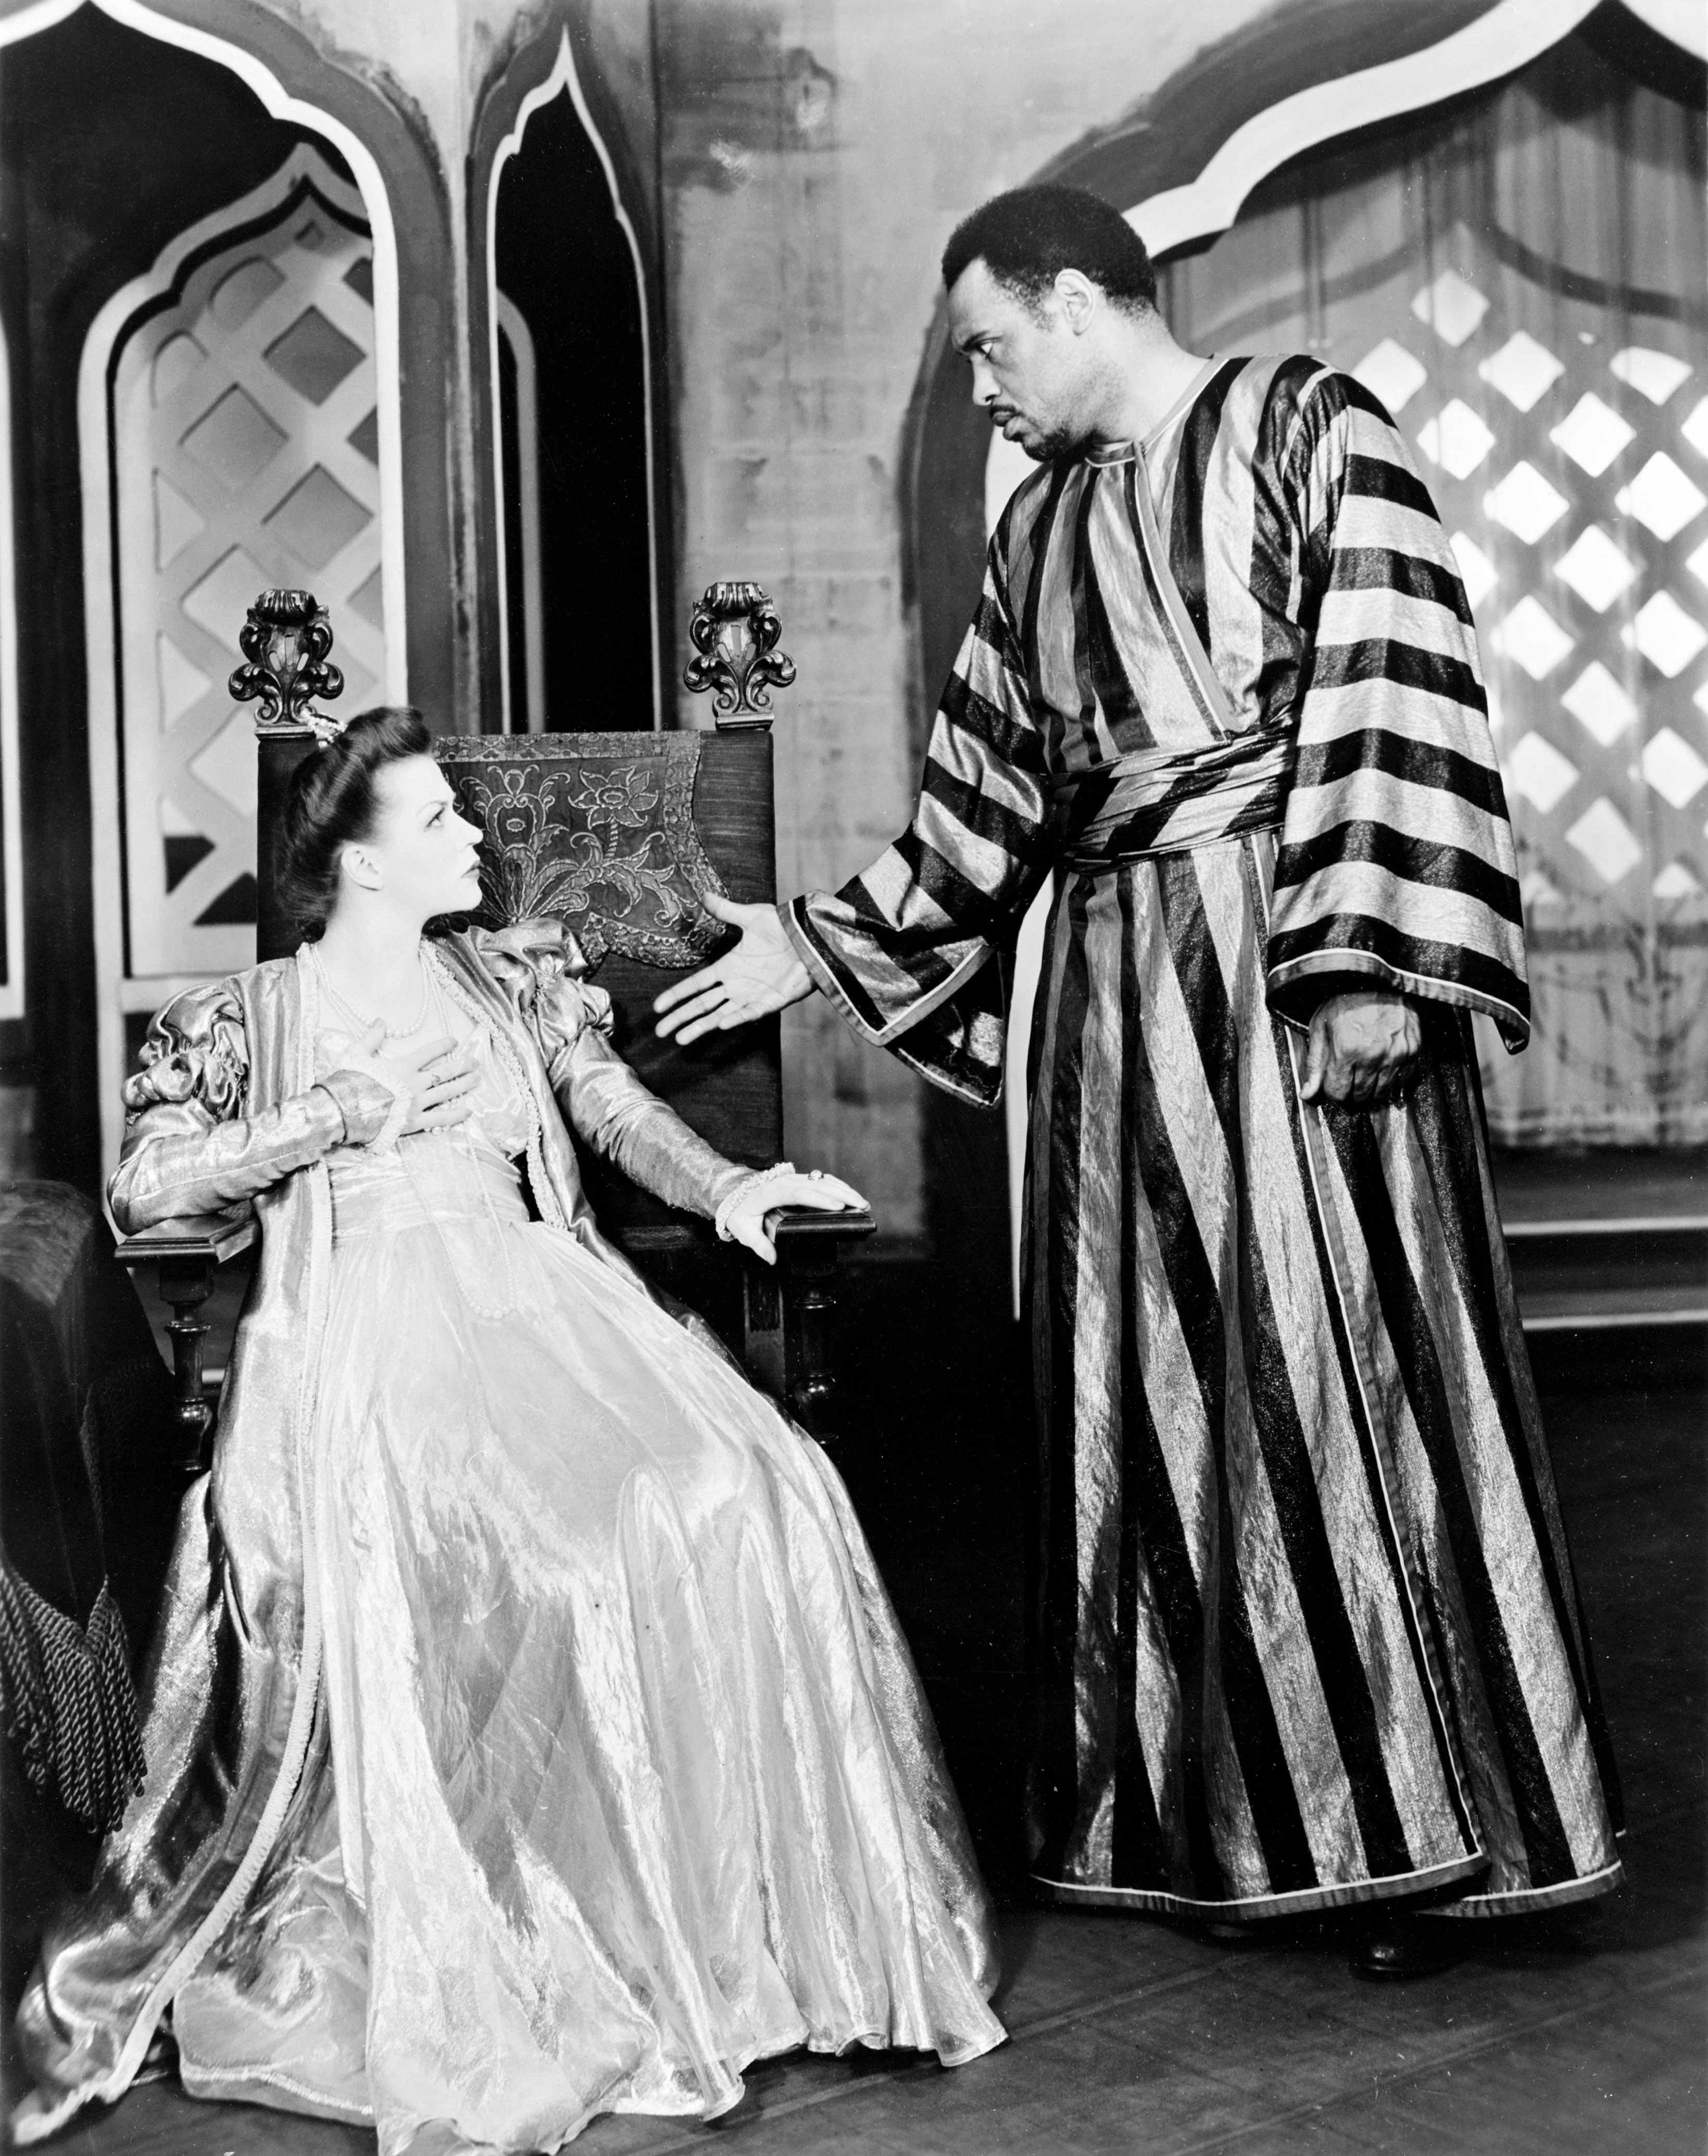 Paul Robeson as Othello and Uta Hagen as Desdemona.